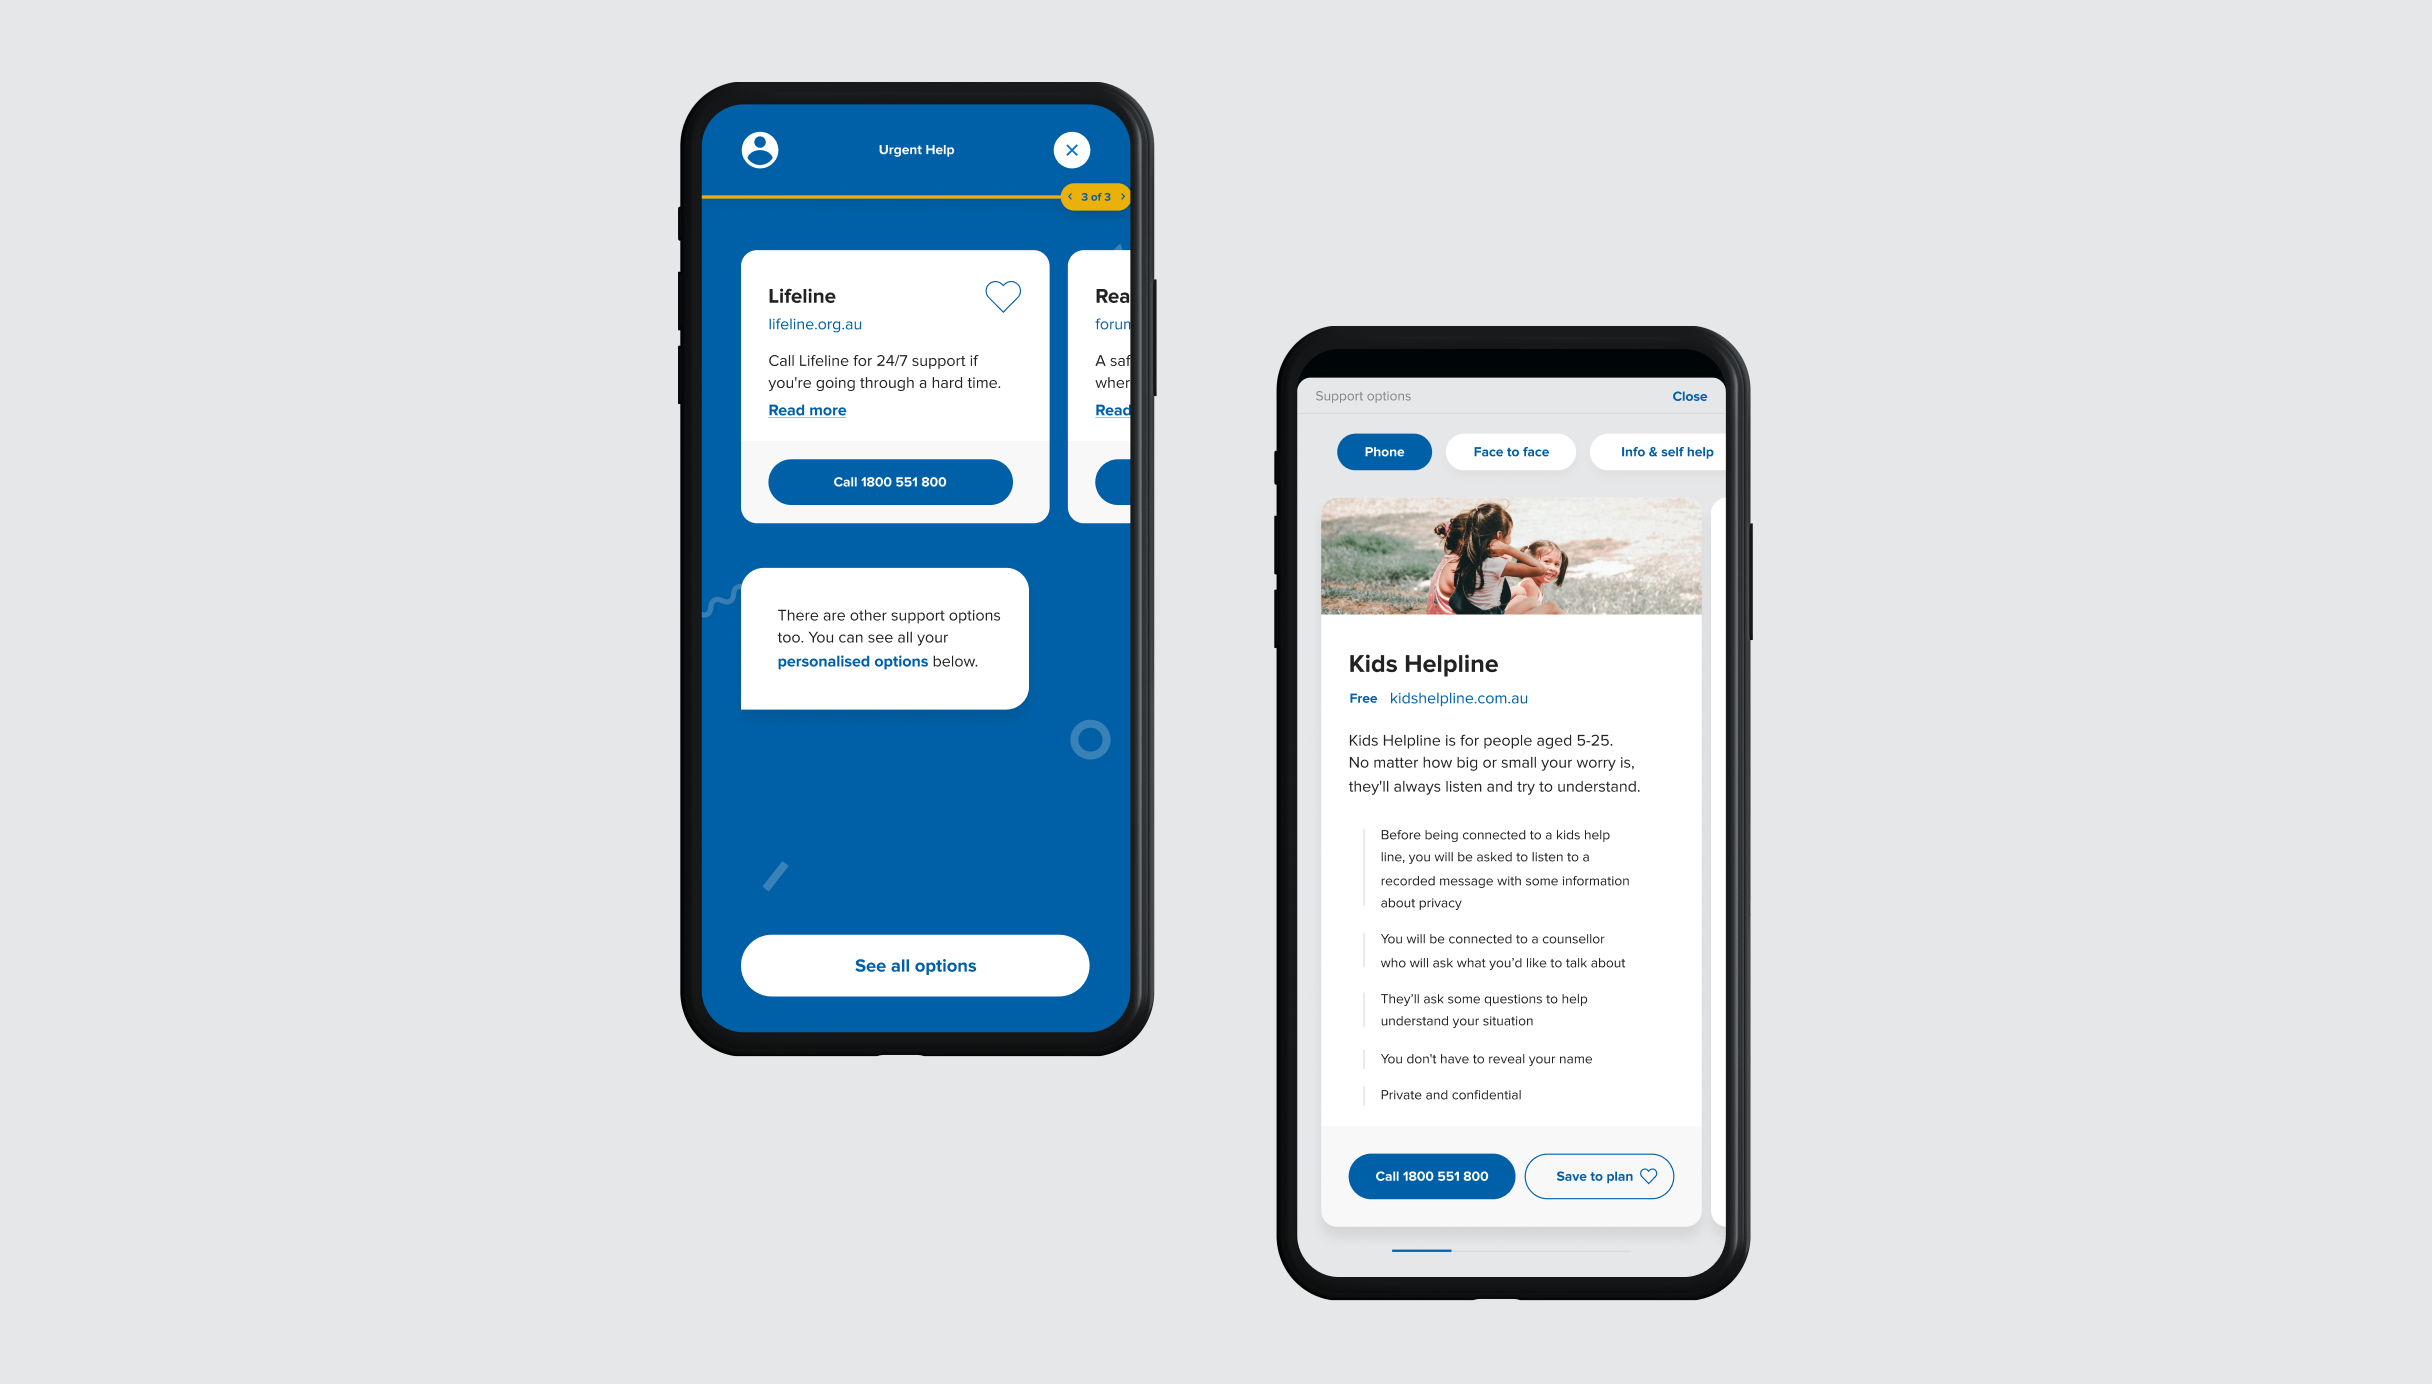 Mobile Next Step final step screen, showcasing Kids Helpline assistance notes